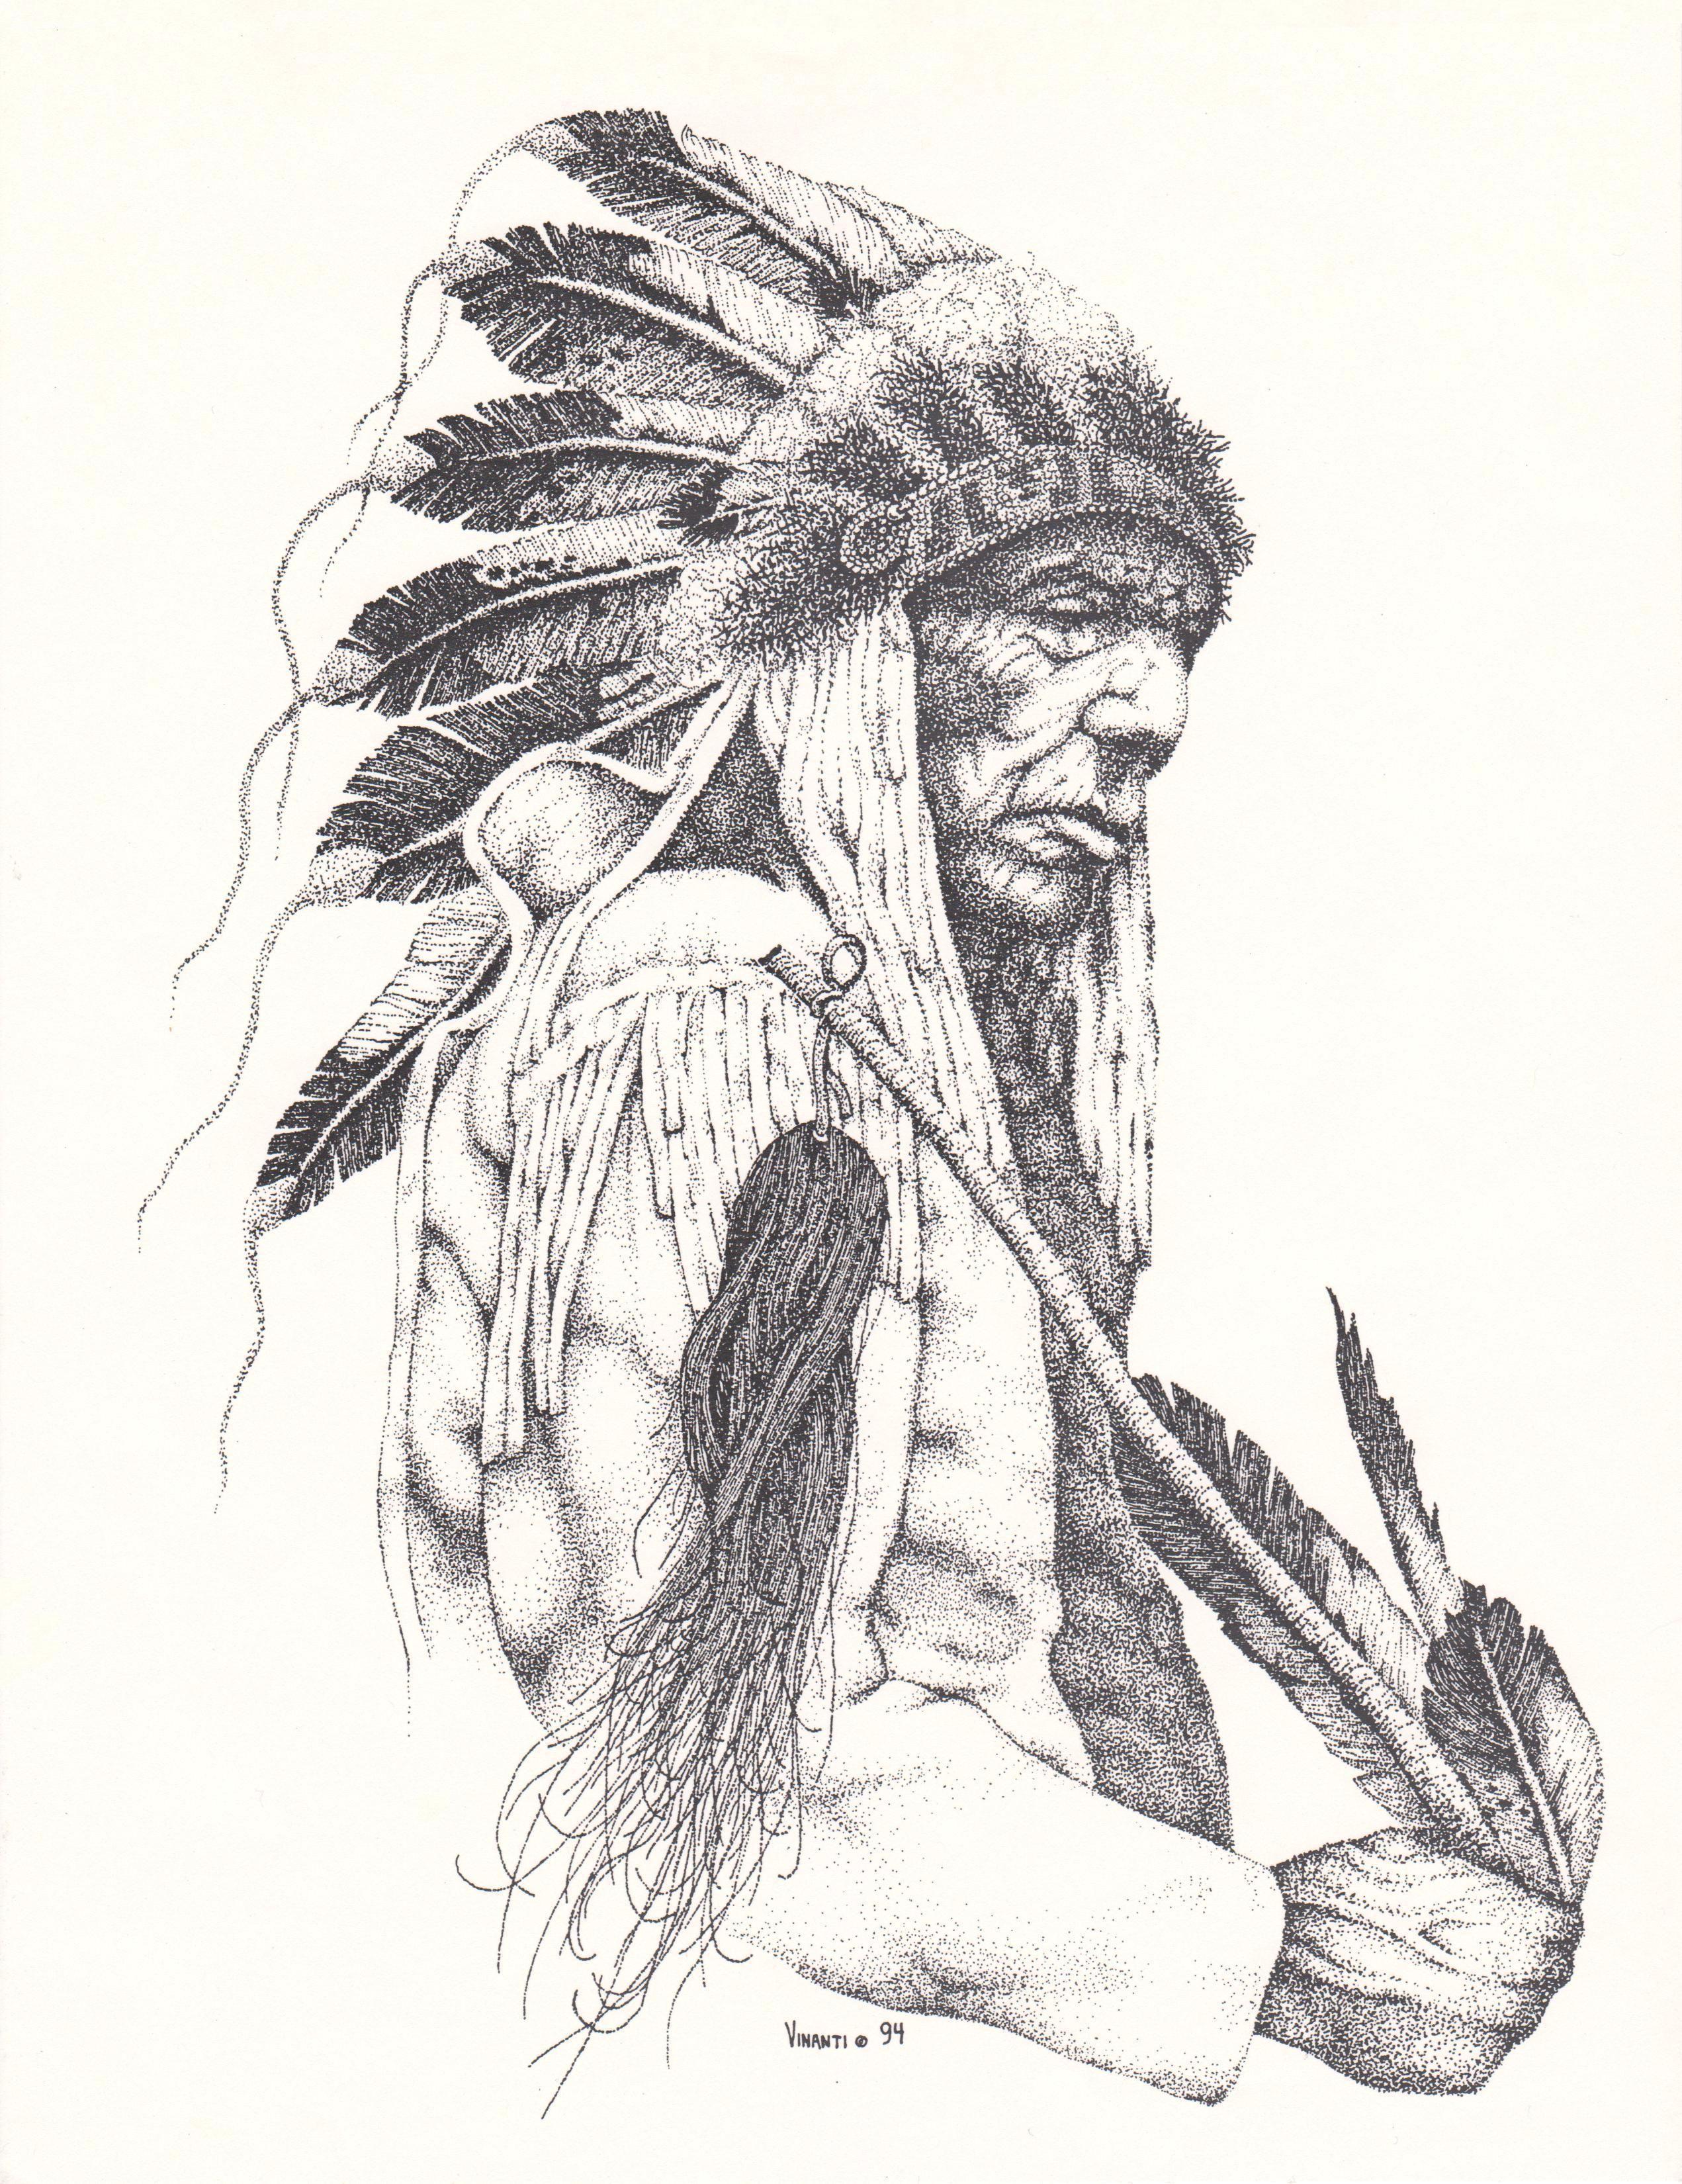 Cheyenne Chief, Pointillism American indian tattoos